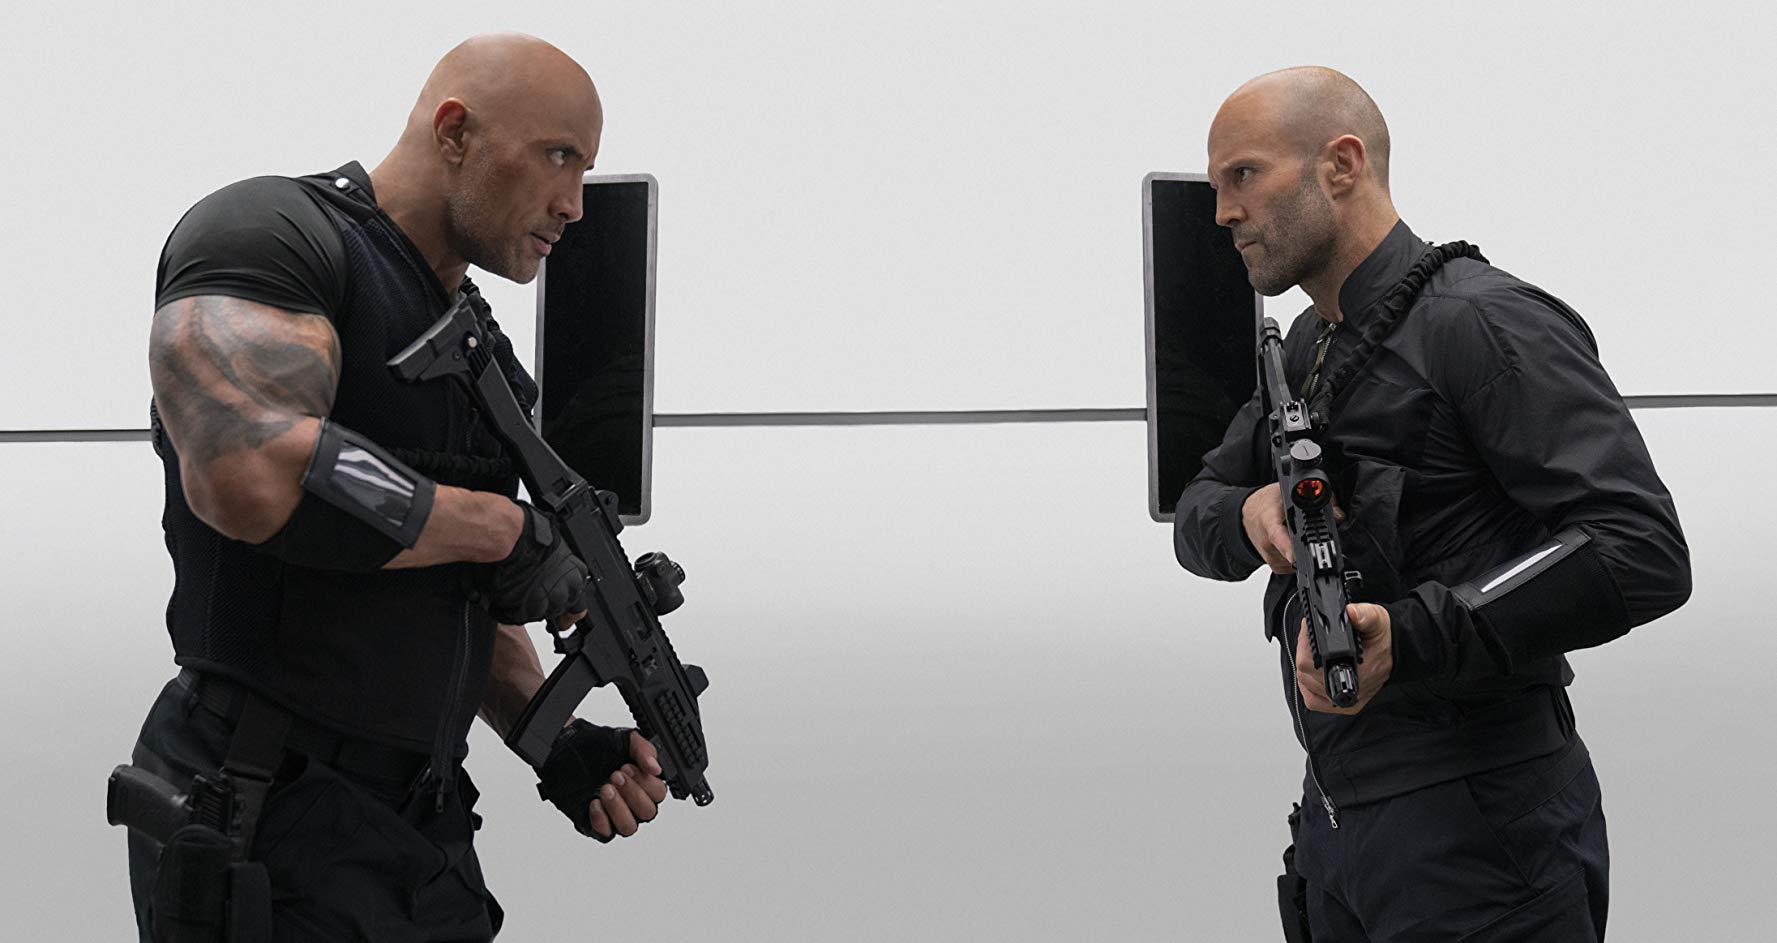 5. Fast & Furious Presents: Hobbs & Shaw 02